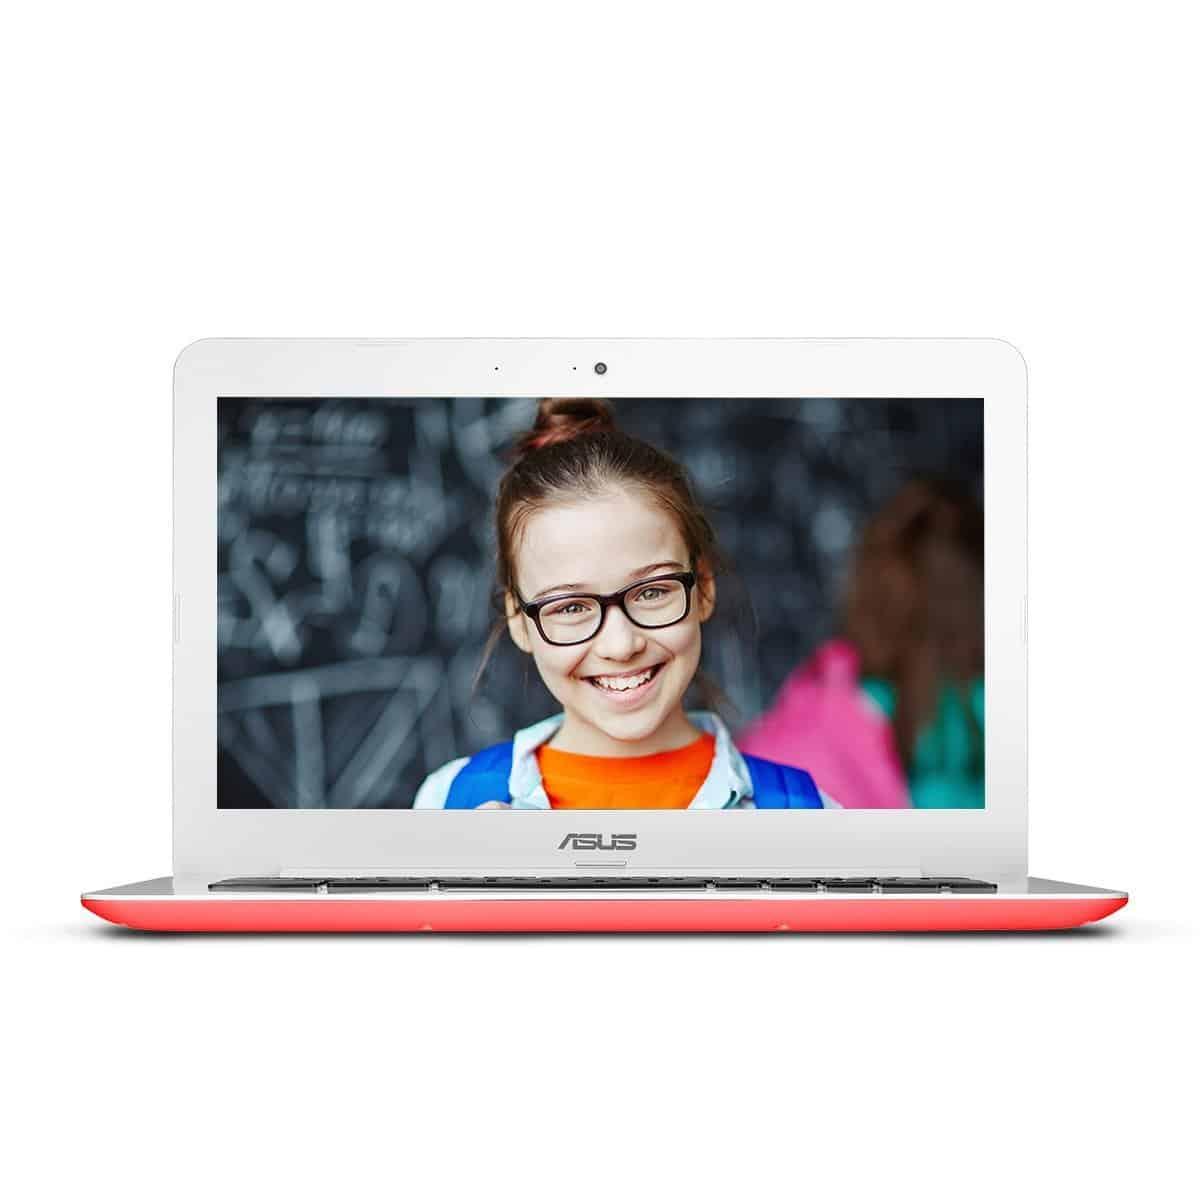 ASUS Chromebook Review